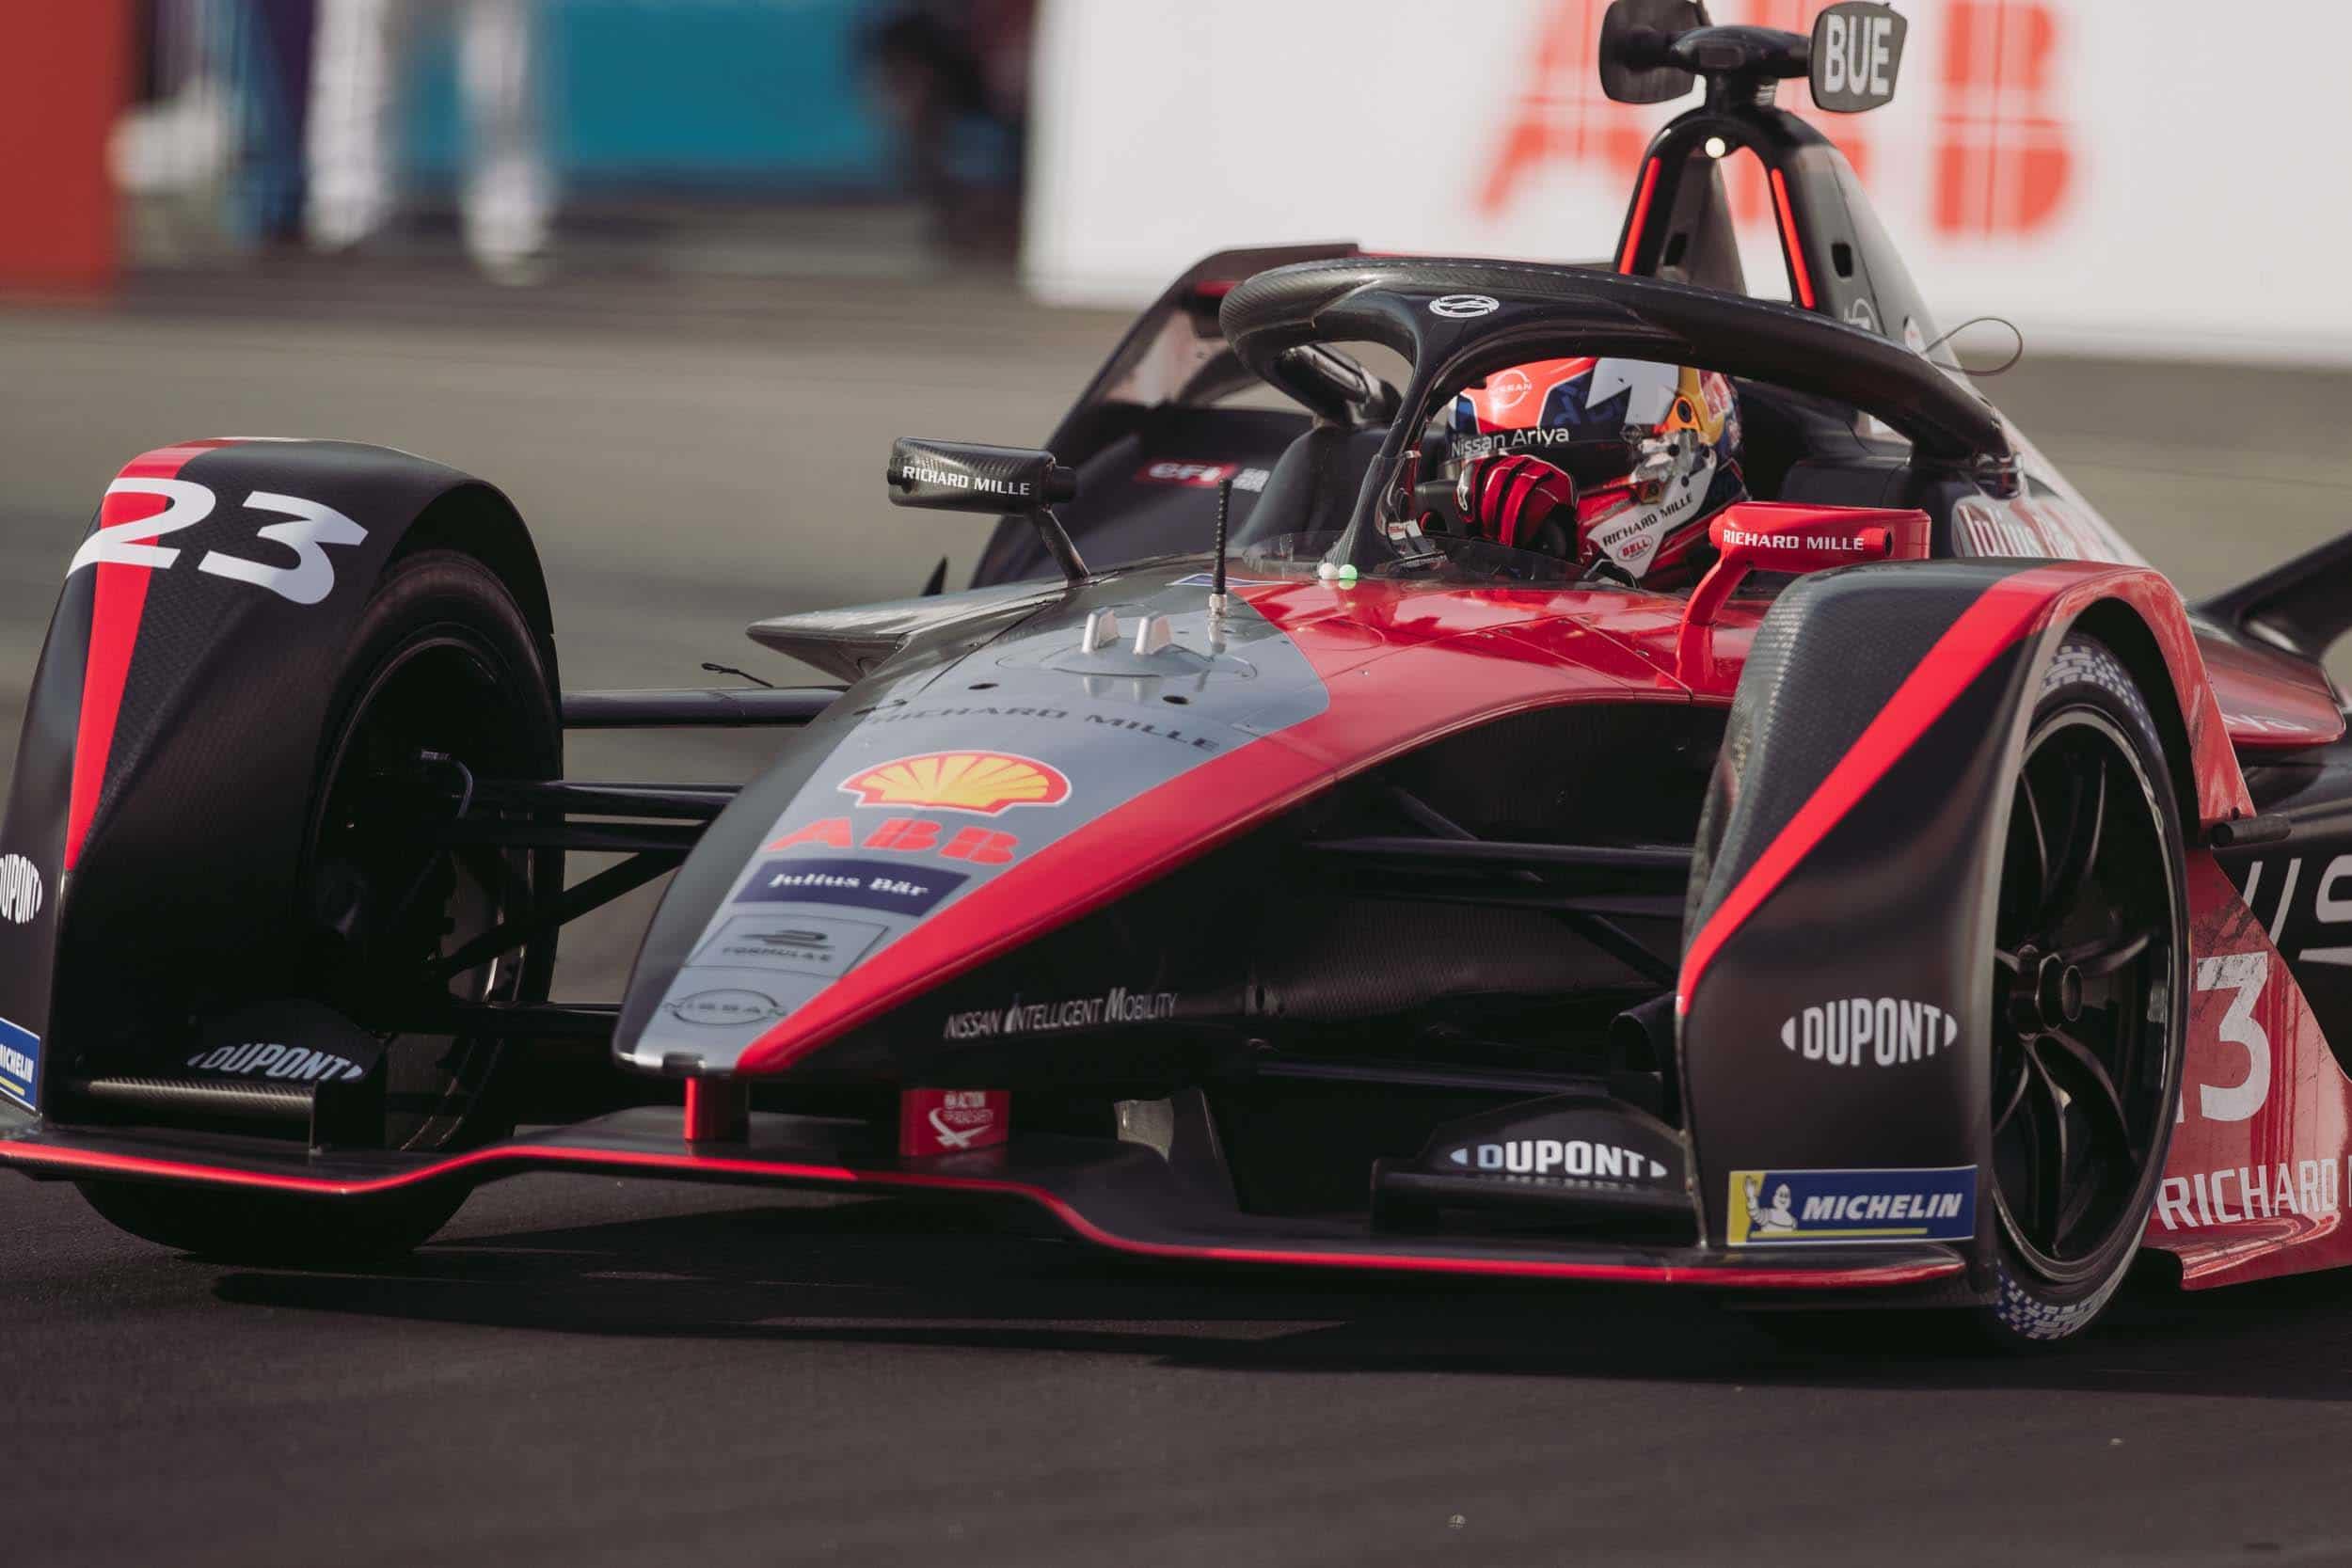 Sebastien Buemi DdRt1roM H Nissan e.dams ταξιδεύει στο Royal Docks για το London E-Prix Formula E, Nissan, Nissan e.dams, ειδήσεις, Νέα